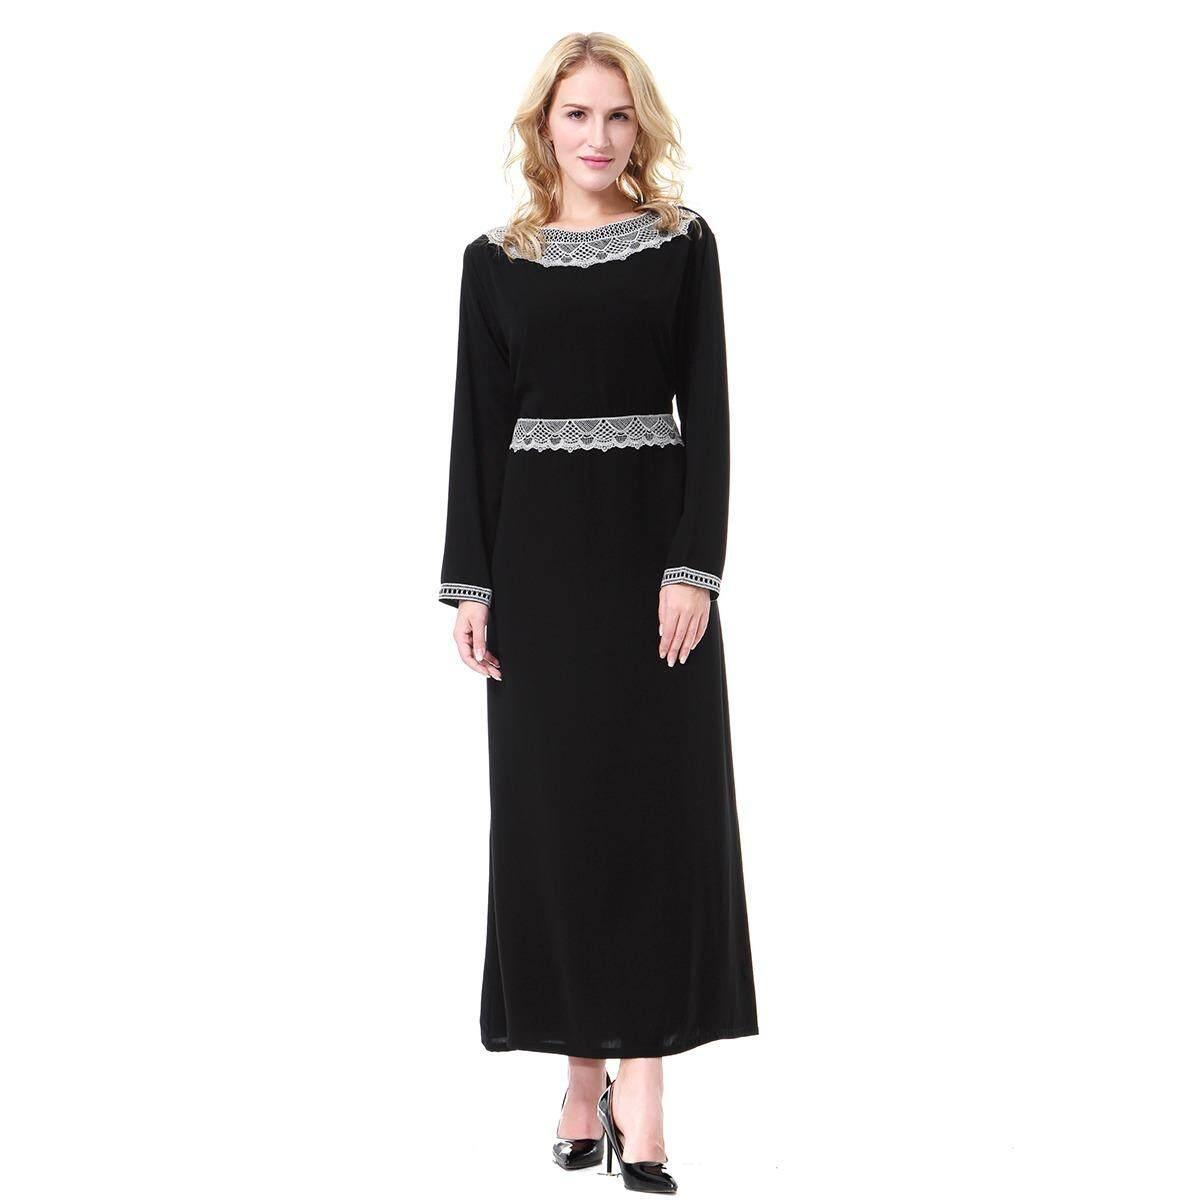 Mode Terkini Busana Wanita Muslim Perak Pola Polyester Abaya Kaftan Lengan Panjang Islam Indonesia Gaun Panjang Jubah